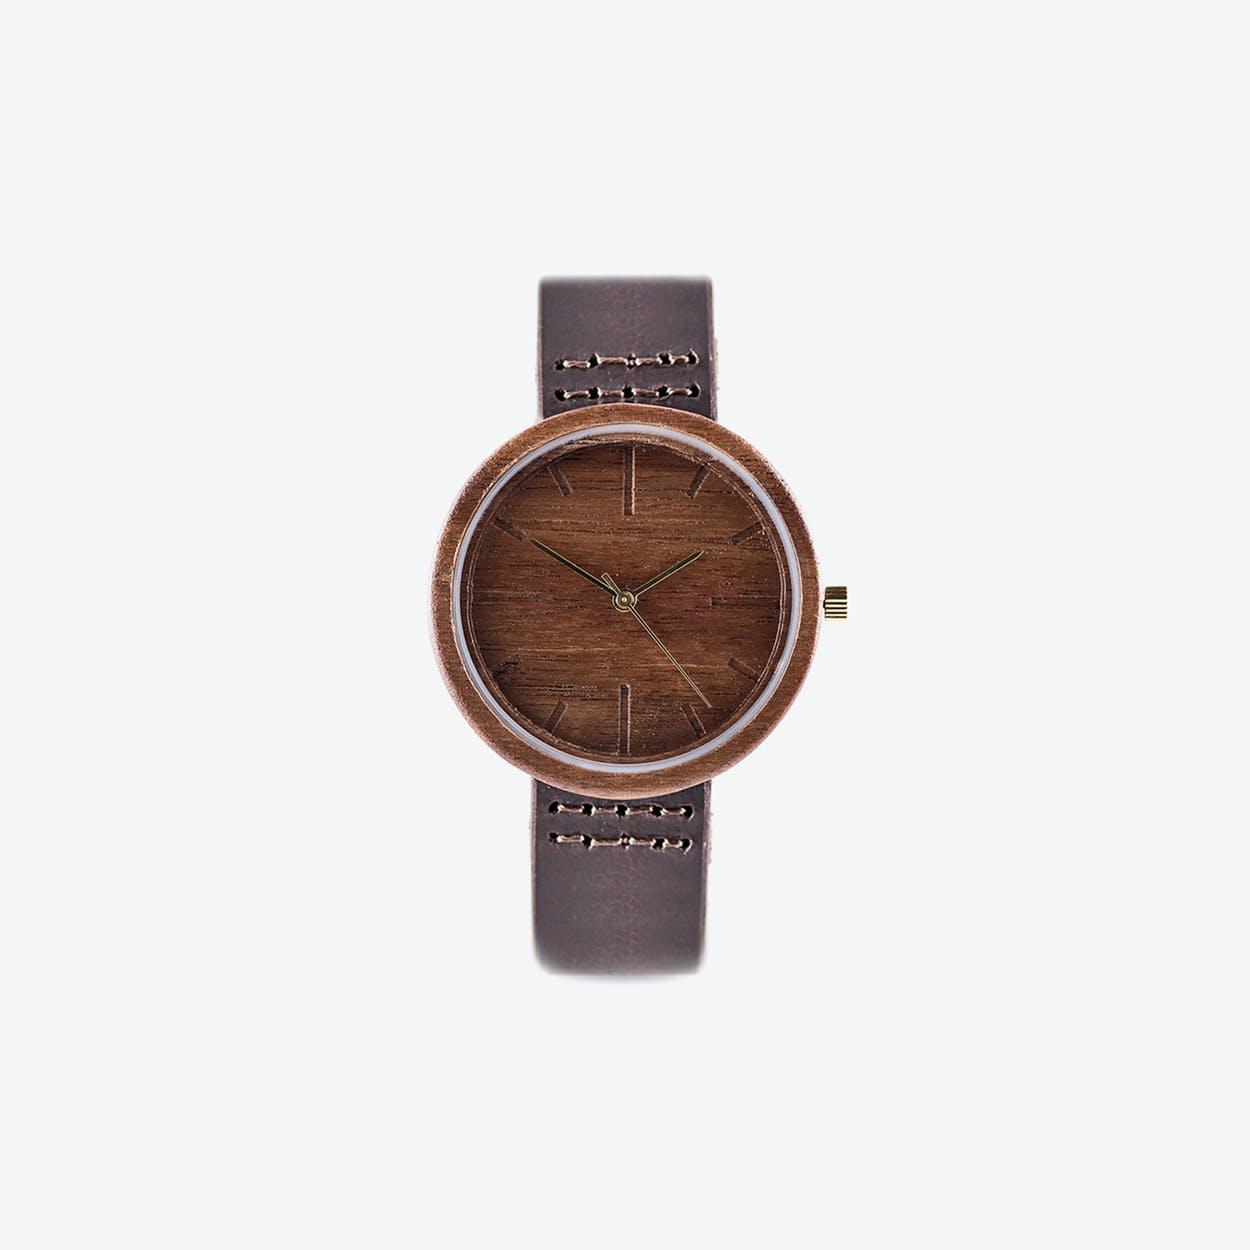 Muile Wooden Watch